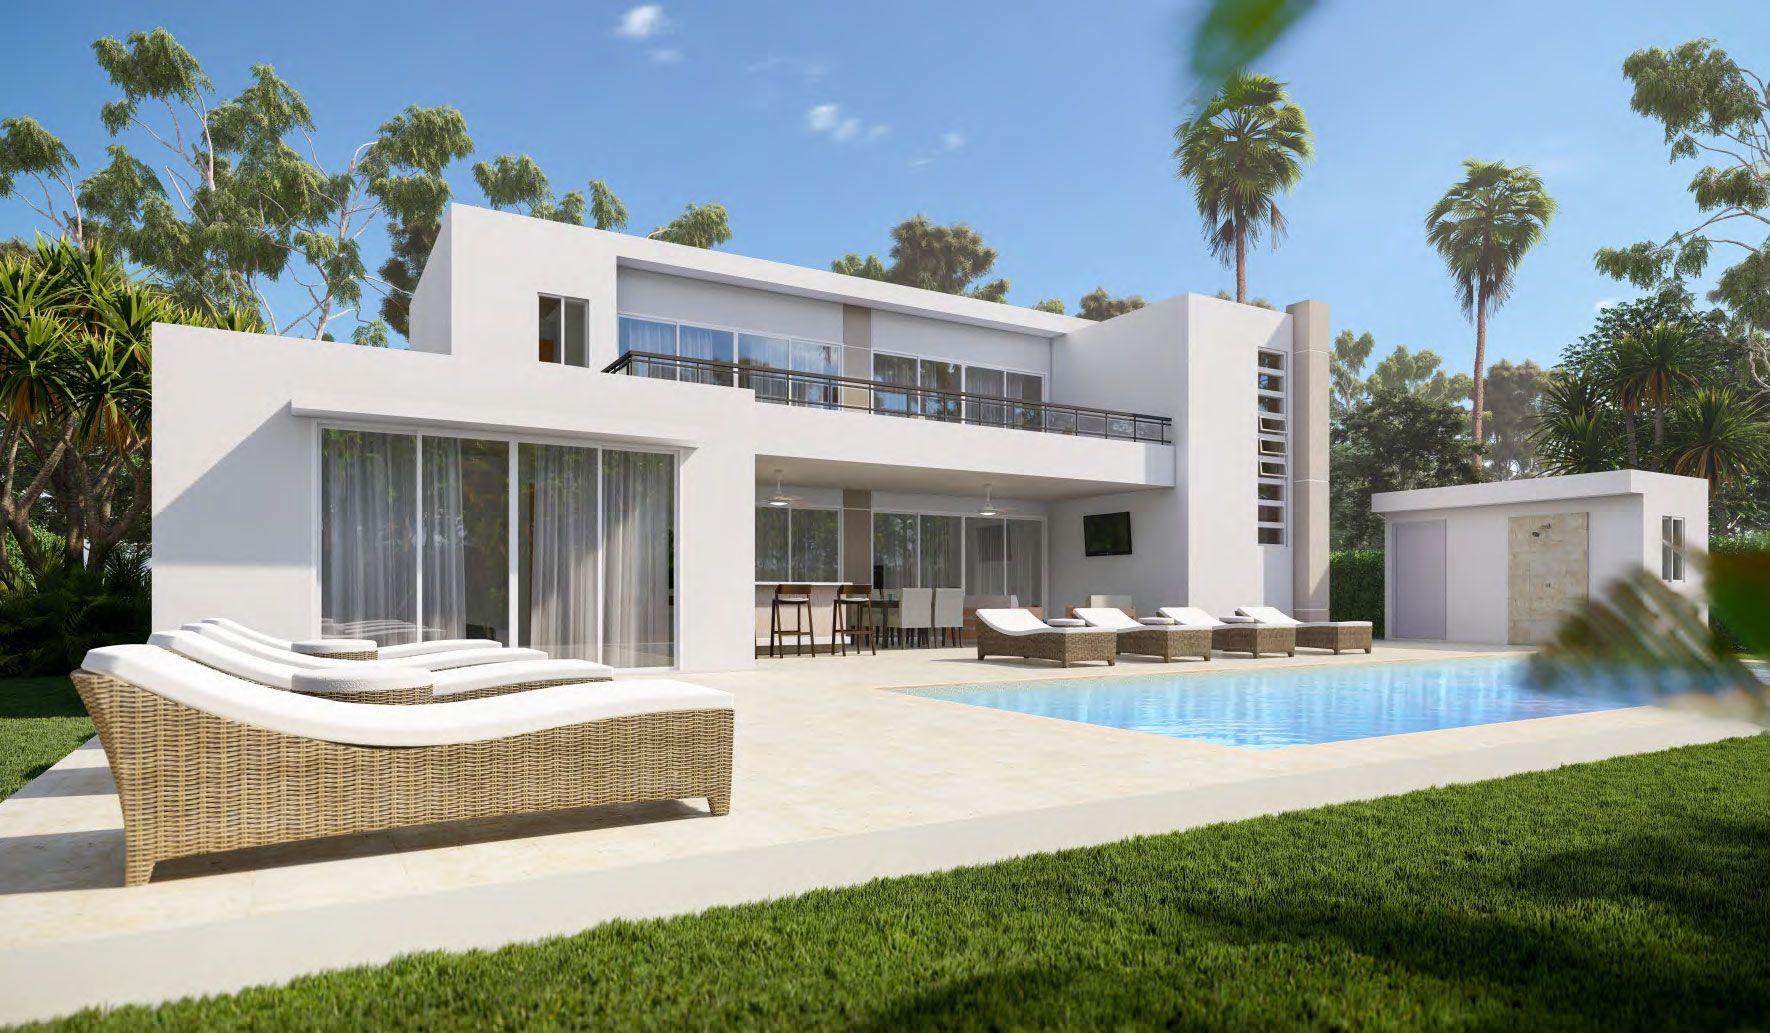 64 Casa Linda Quality Homes Dominican Republic Ideas Architectural Services Gated Community Dominican Republic